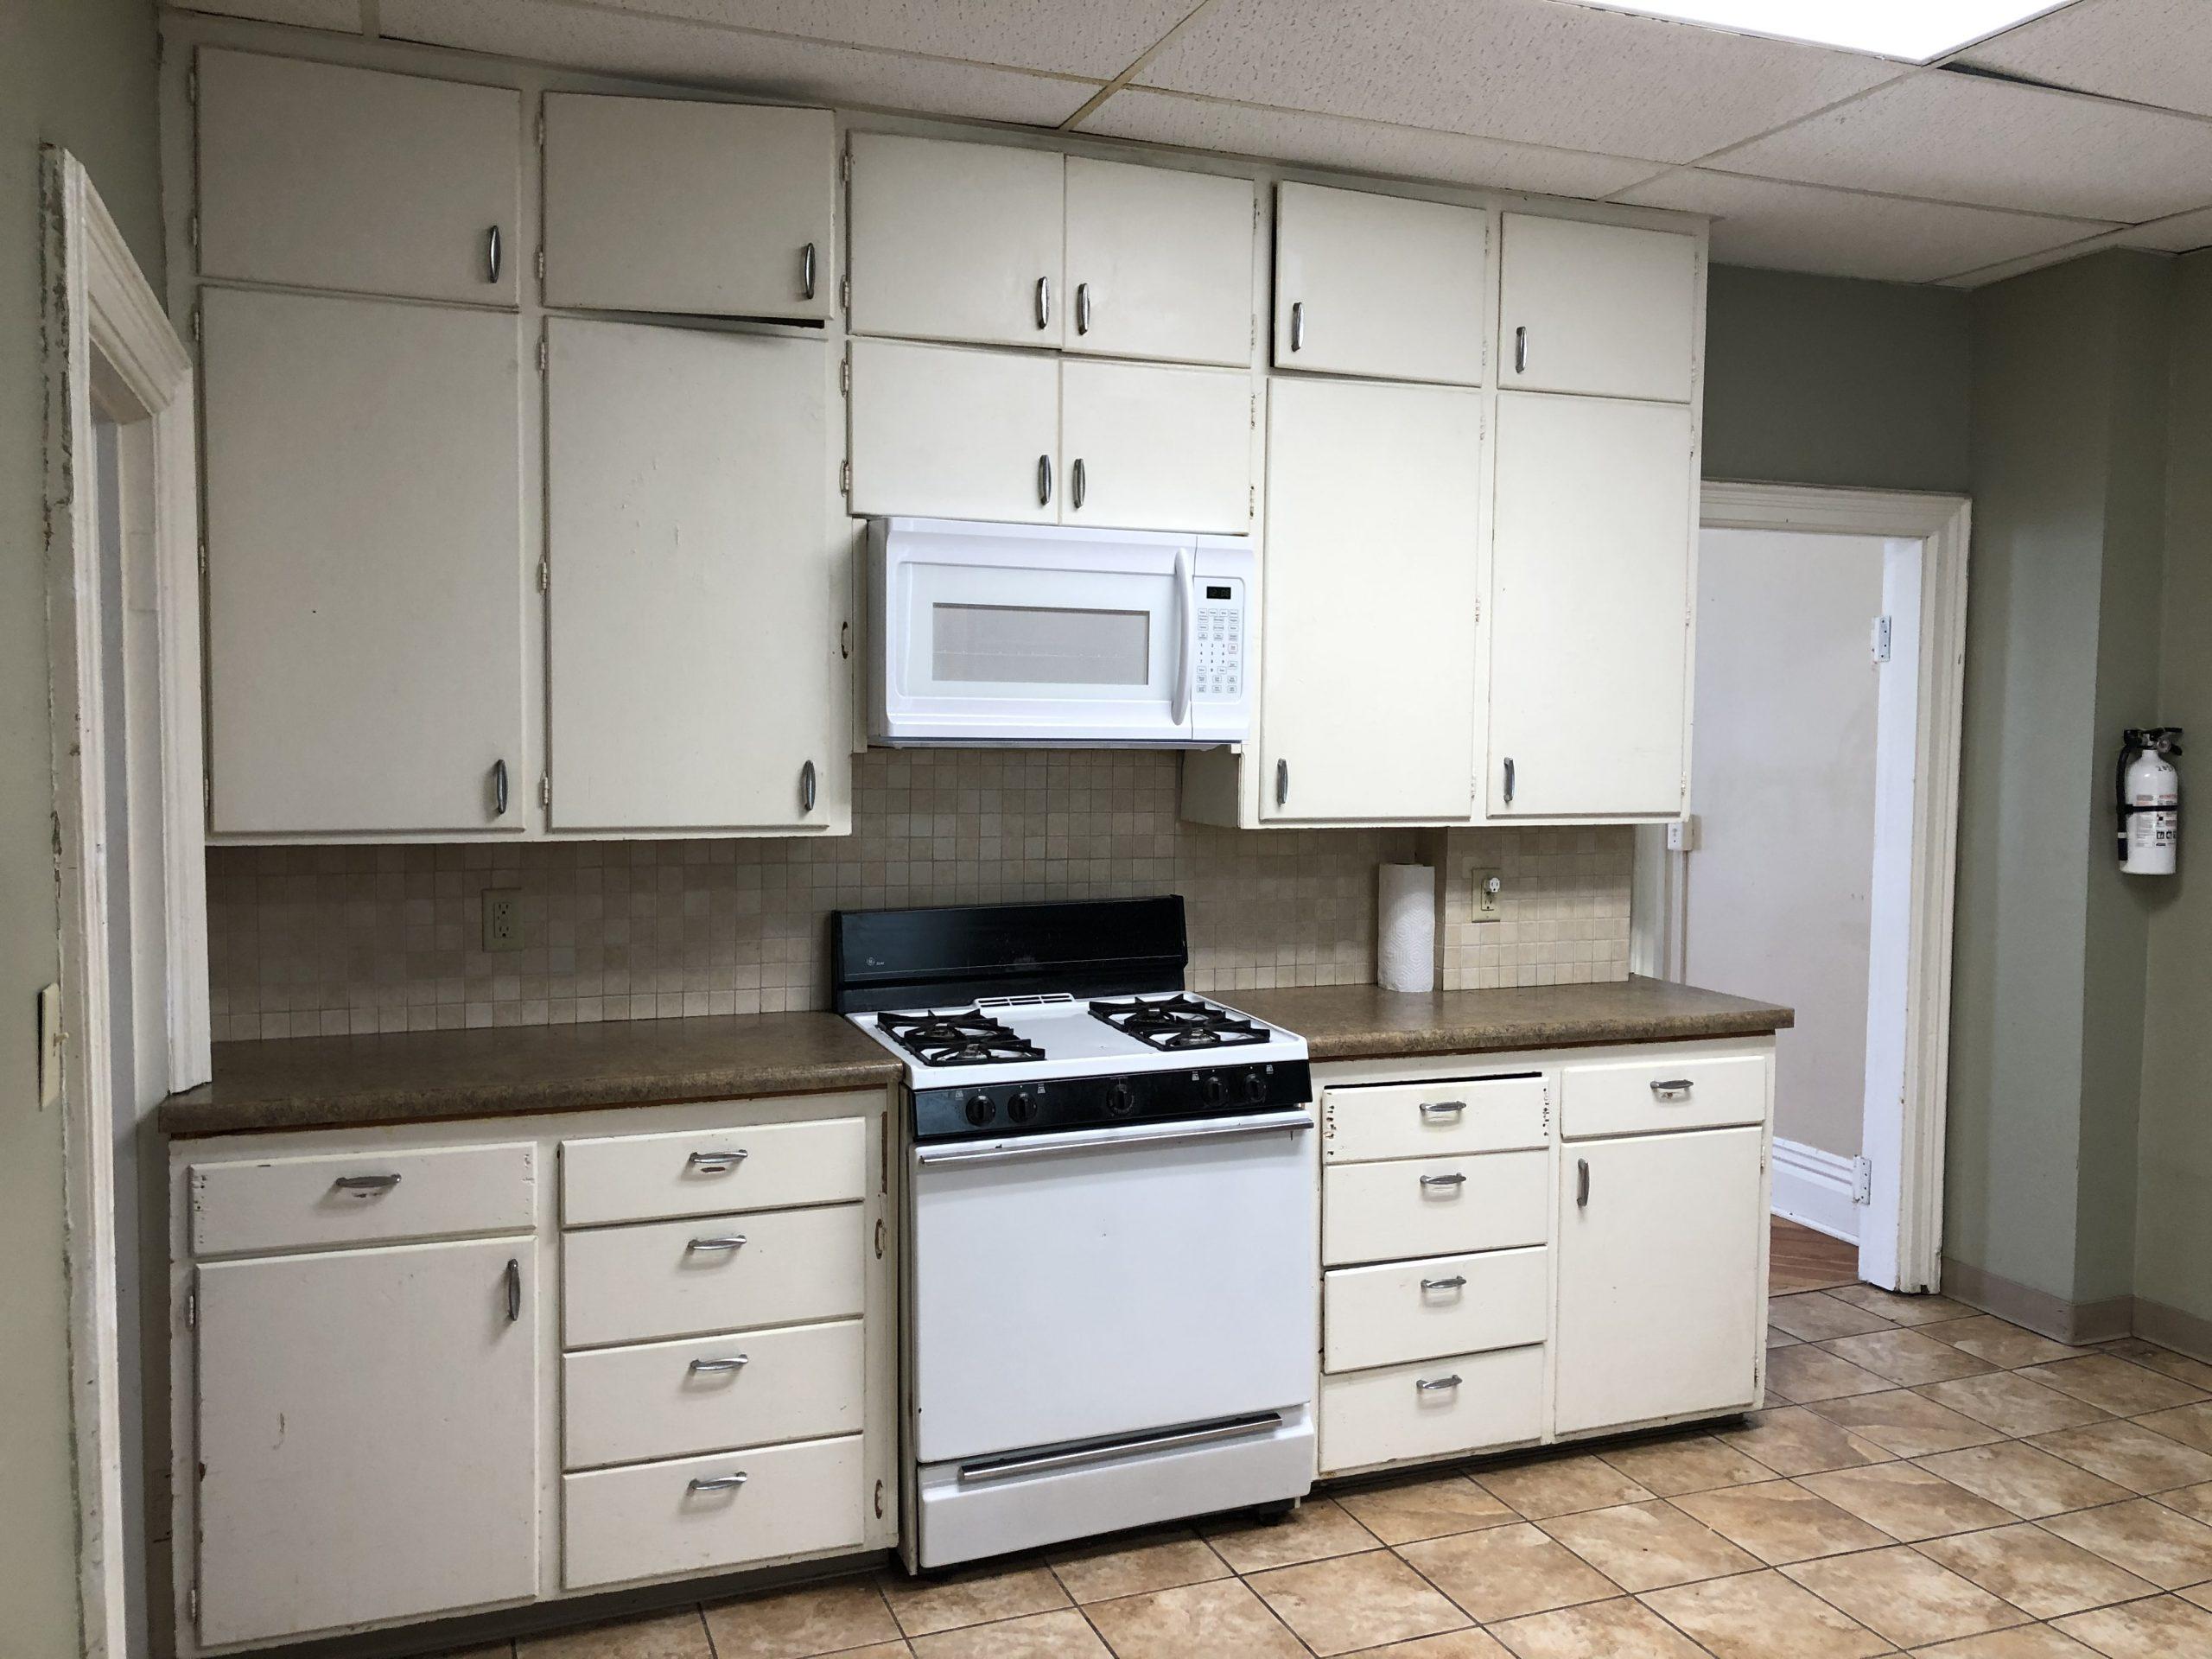 604-clinton_kitchen_iowa-city_j-and-j-apartments